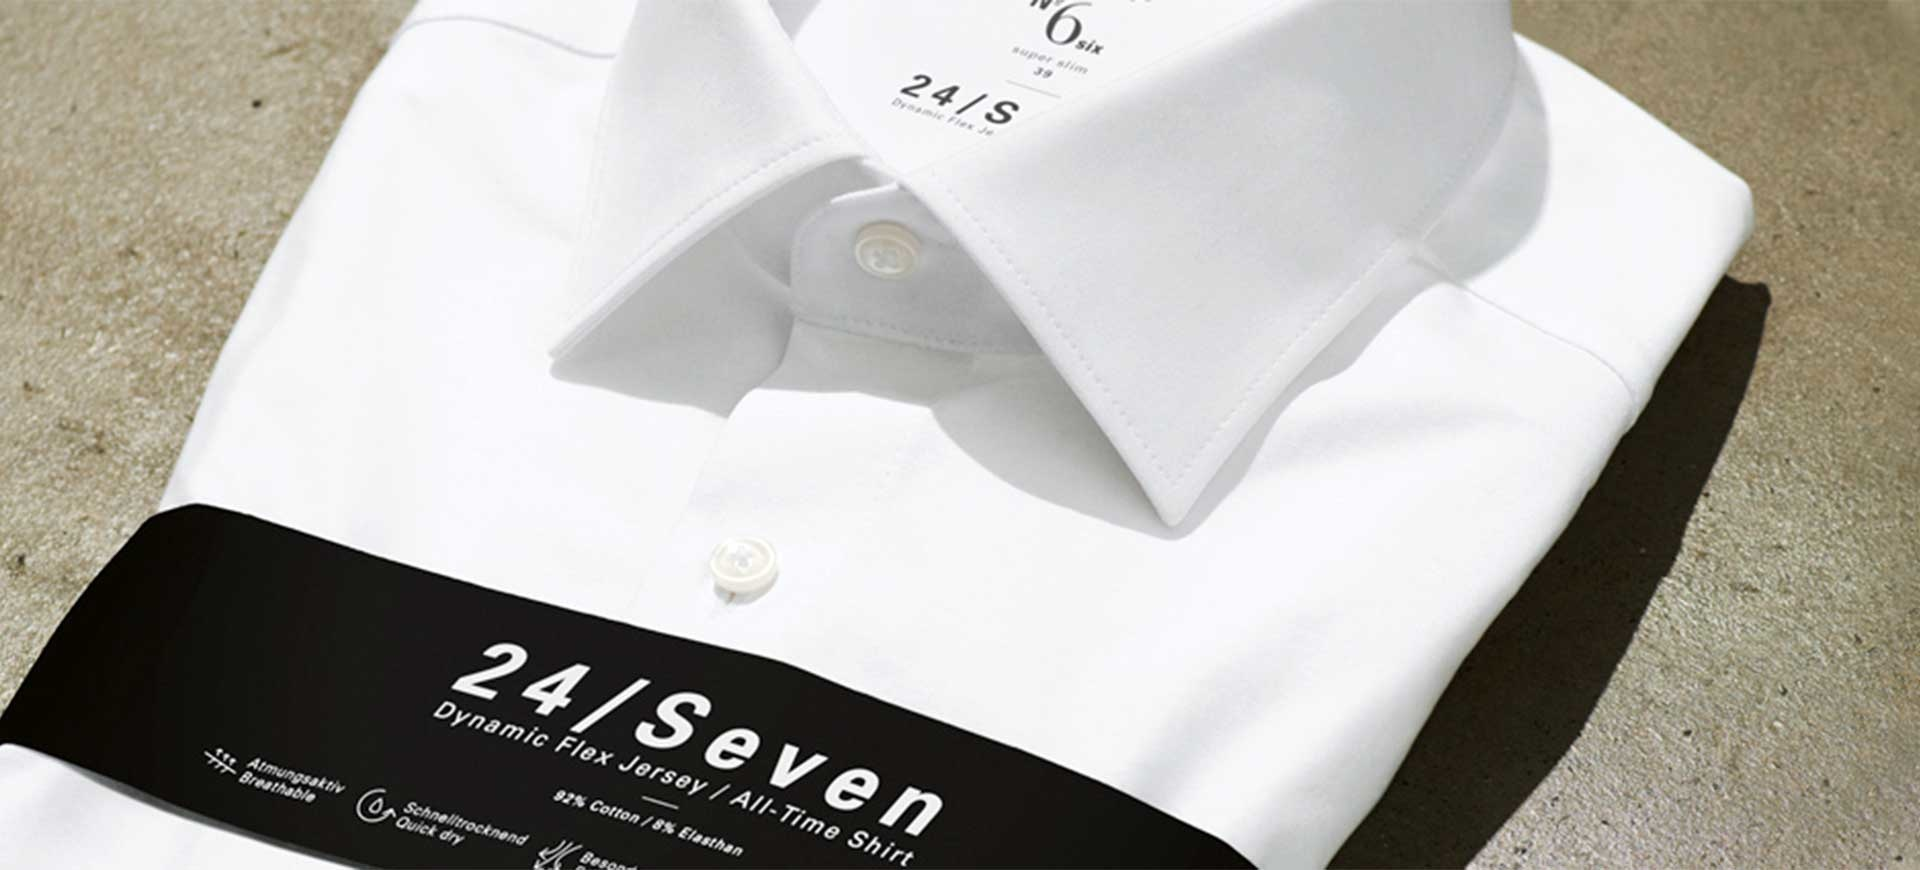 Olymp 24 / Seven Dynamic Flex Jersey / All-Time Shirt